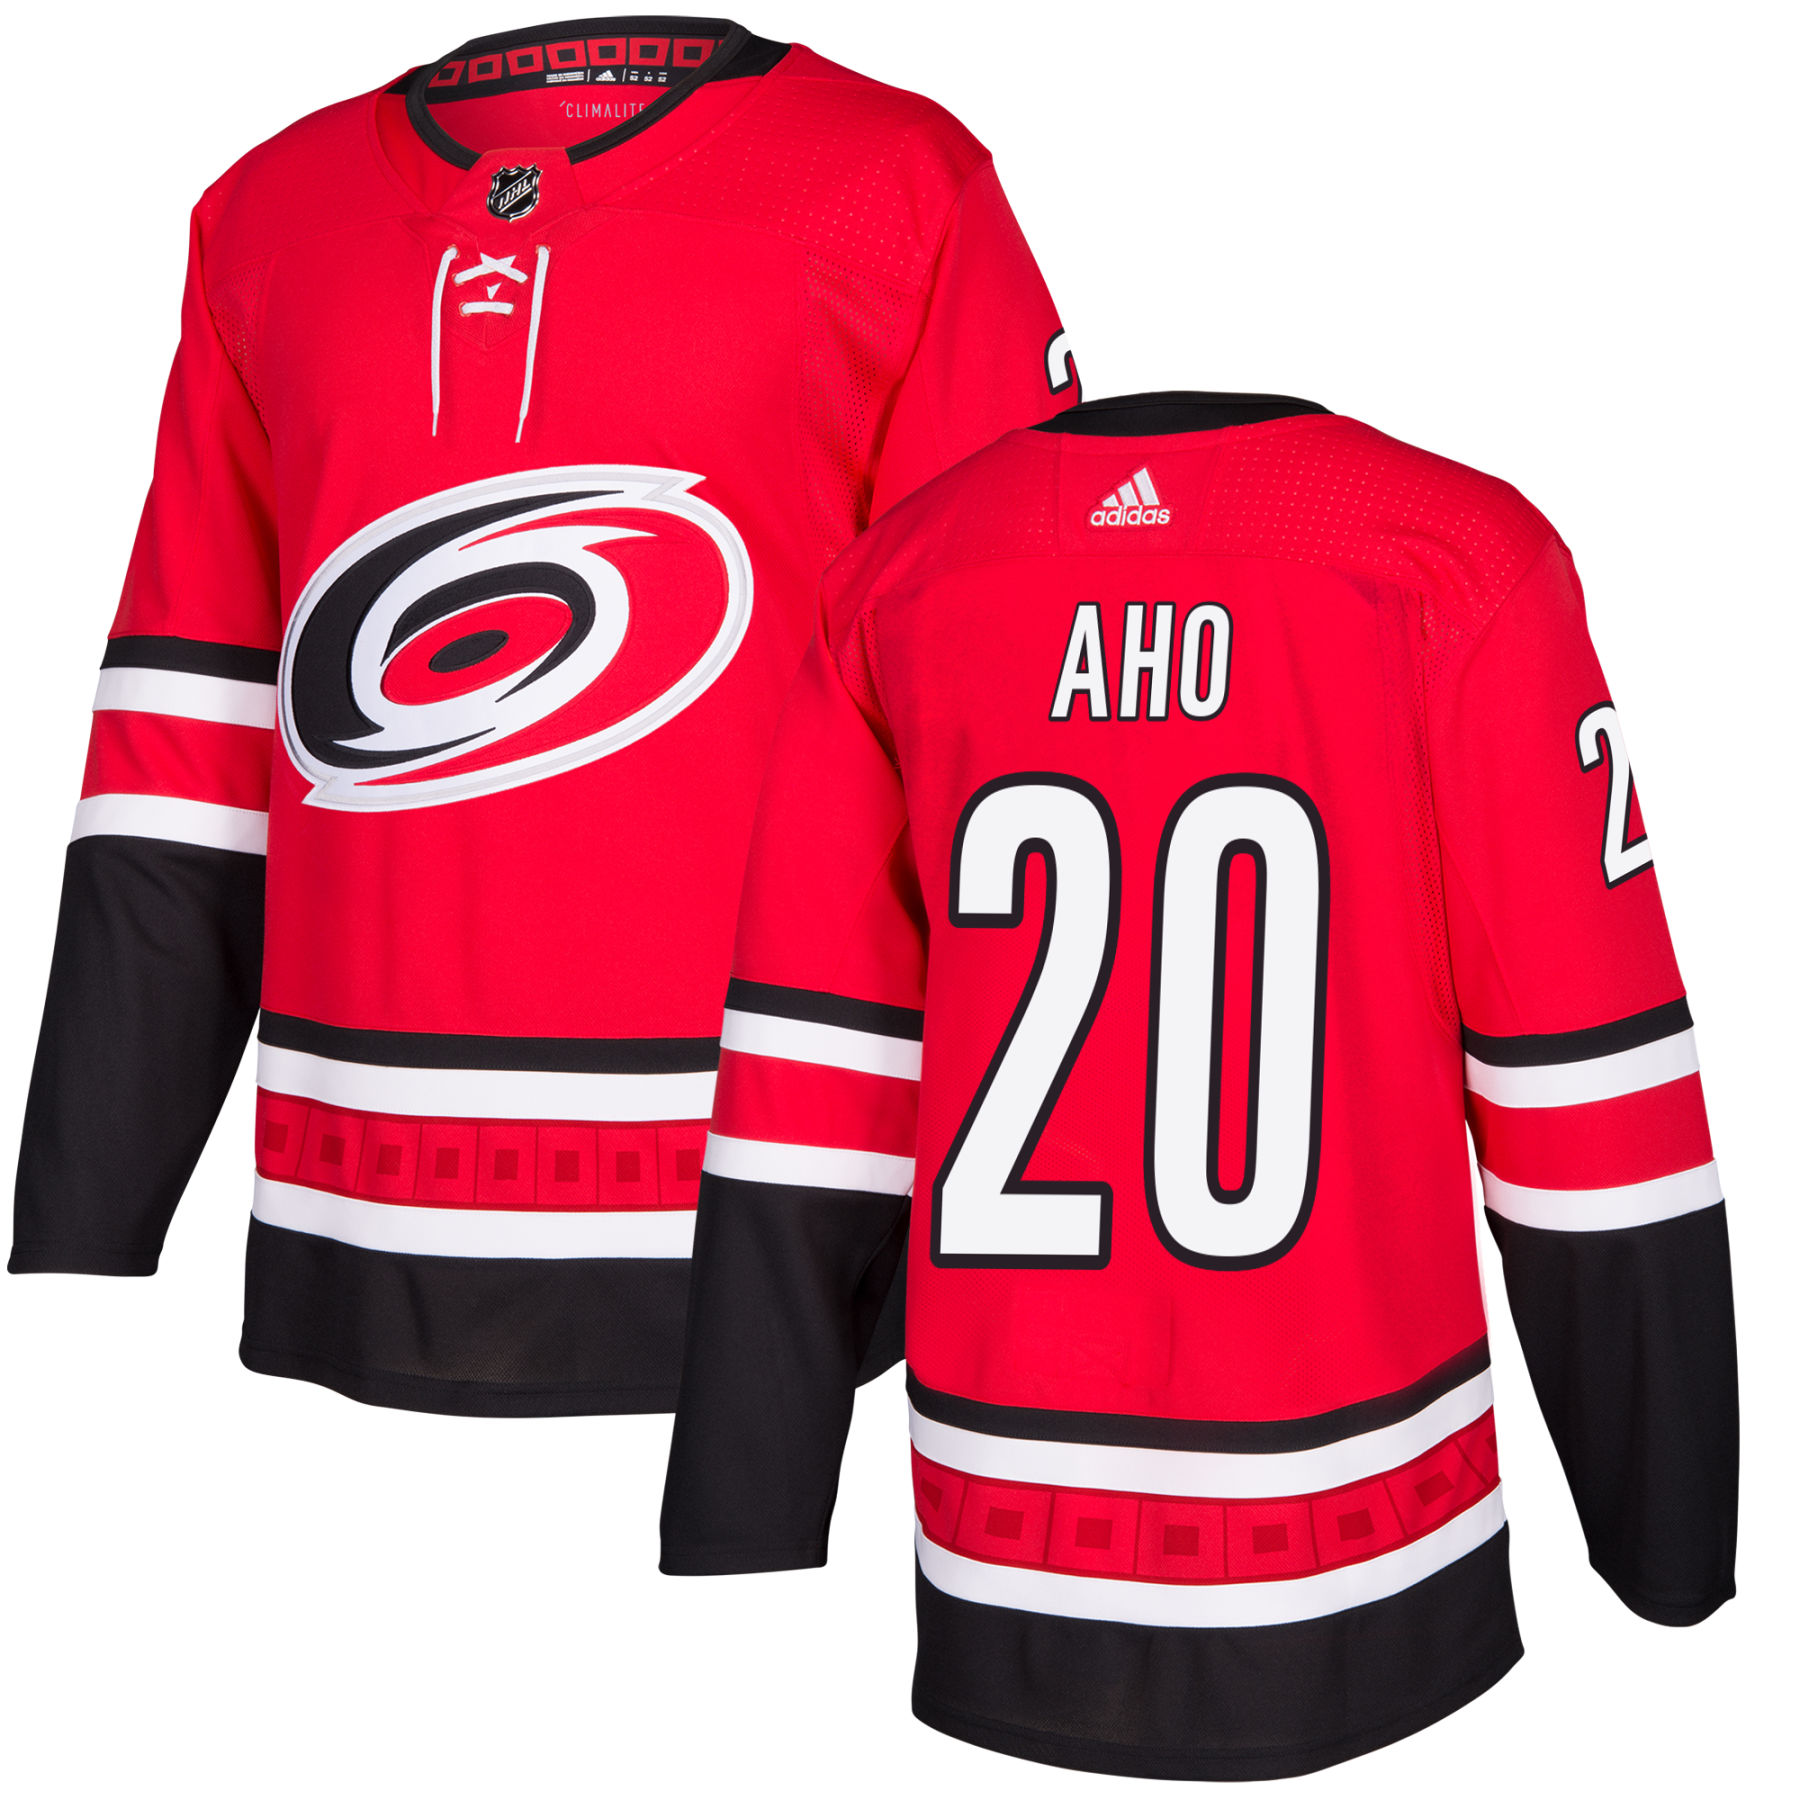 reputable site d8bf2 12cb8 Sebastian Aho Carolina Hurricanes adidas NHL Authentic Pro Home Jersey -  Pro Stitched